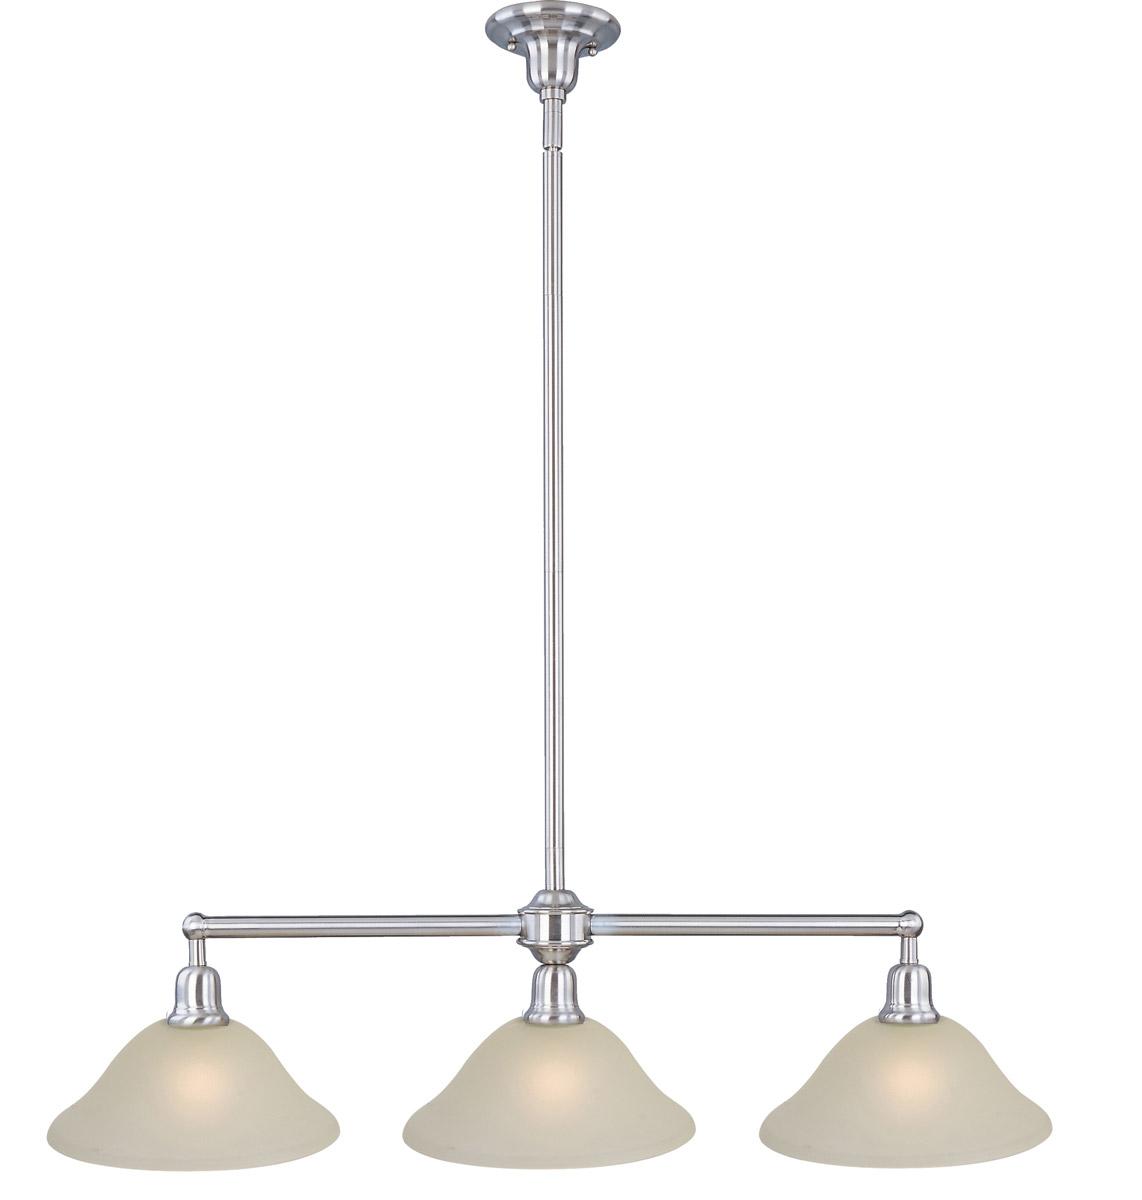 Maxim Lighting Bel Air 3-Light Island Pendant, Satin Nickel